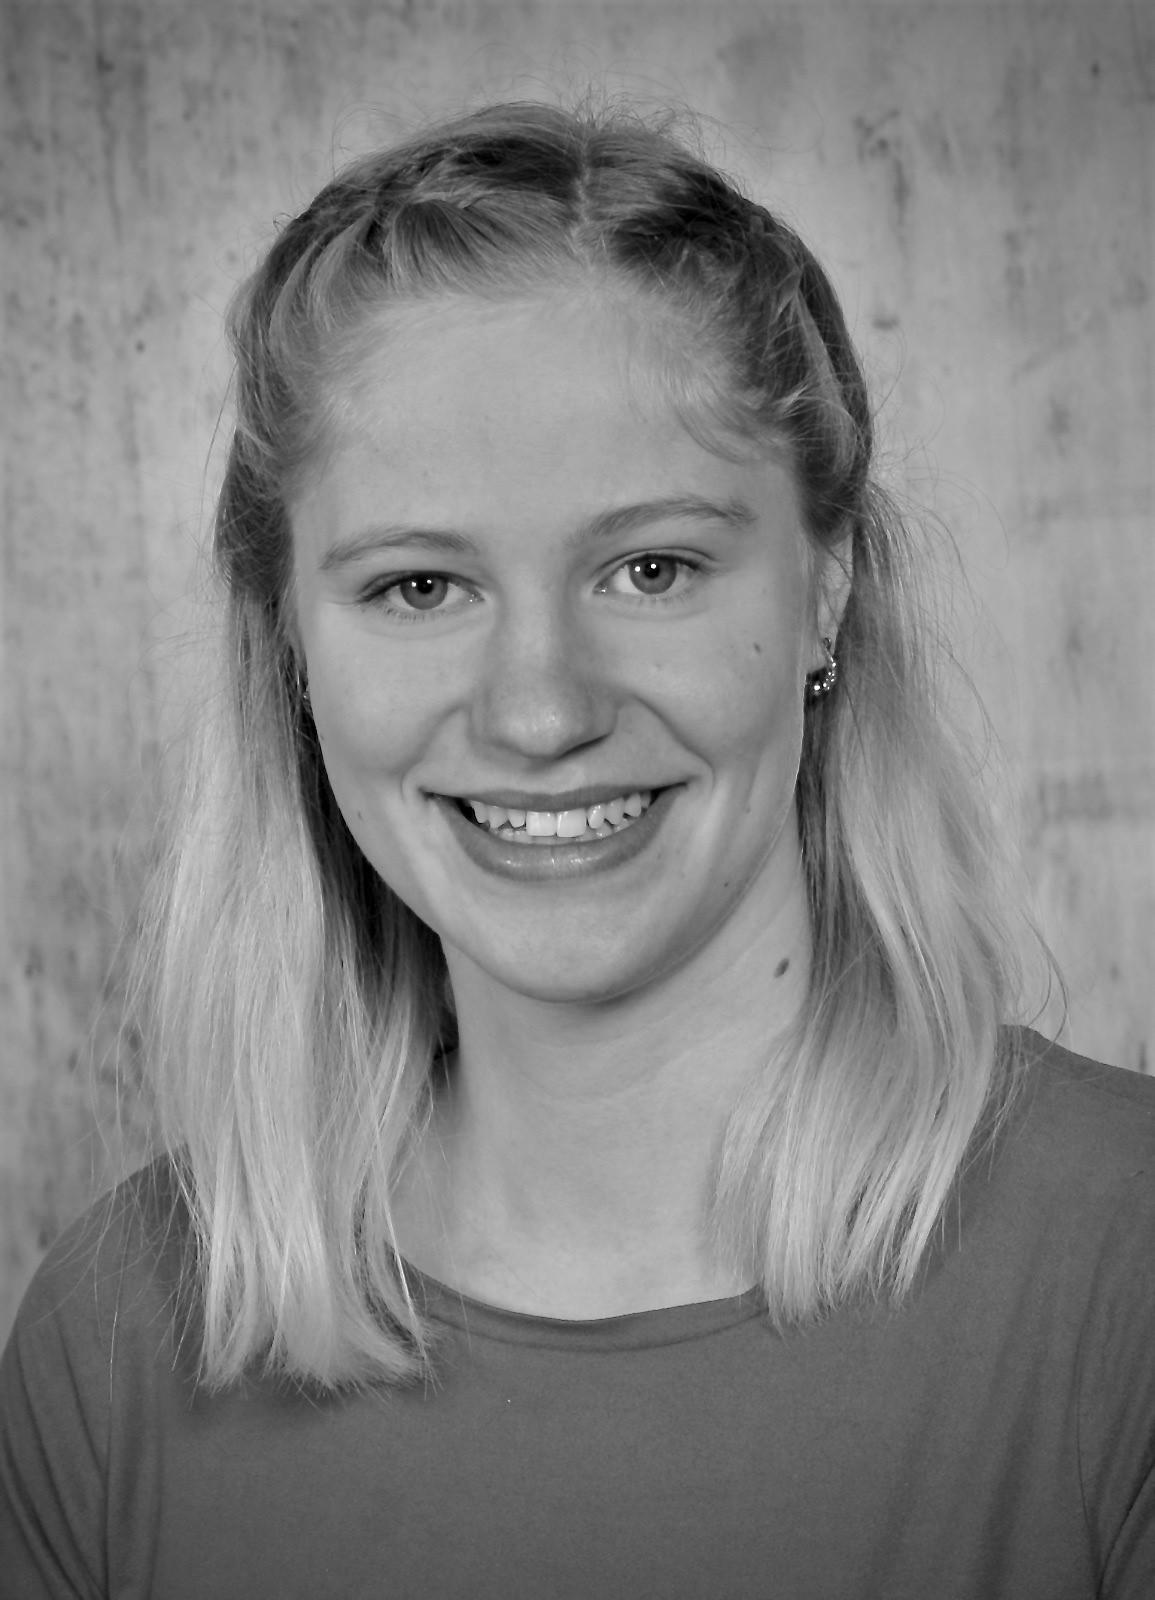 Hannah Tappeiner (Austria)